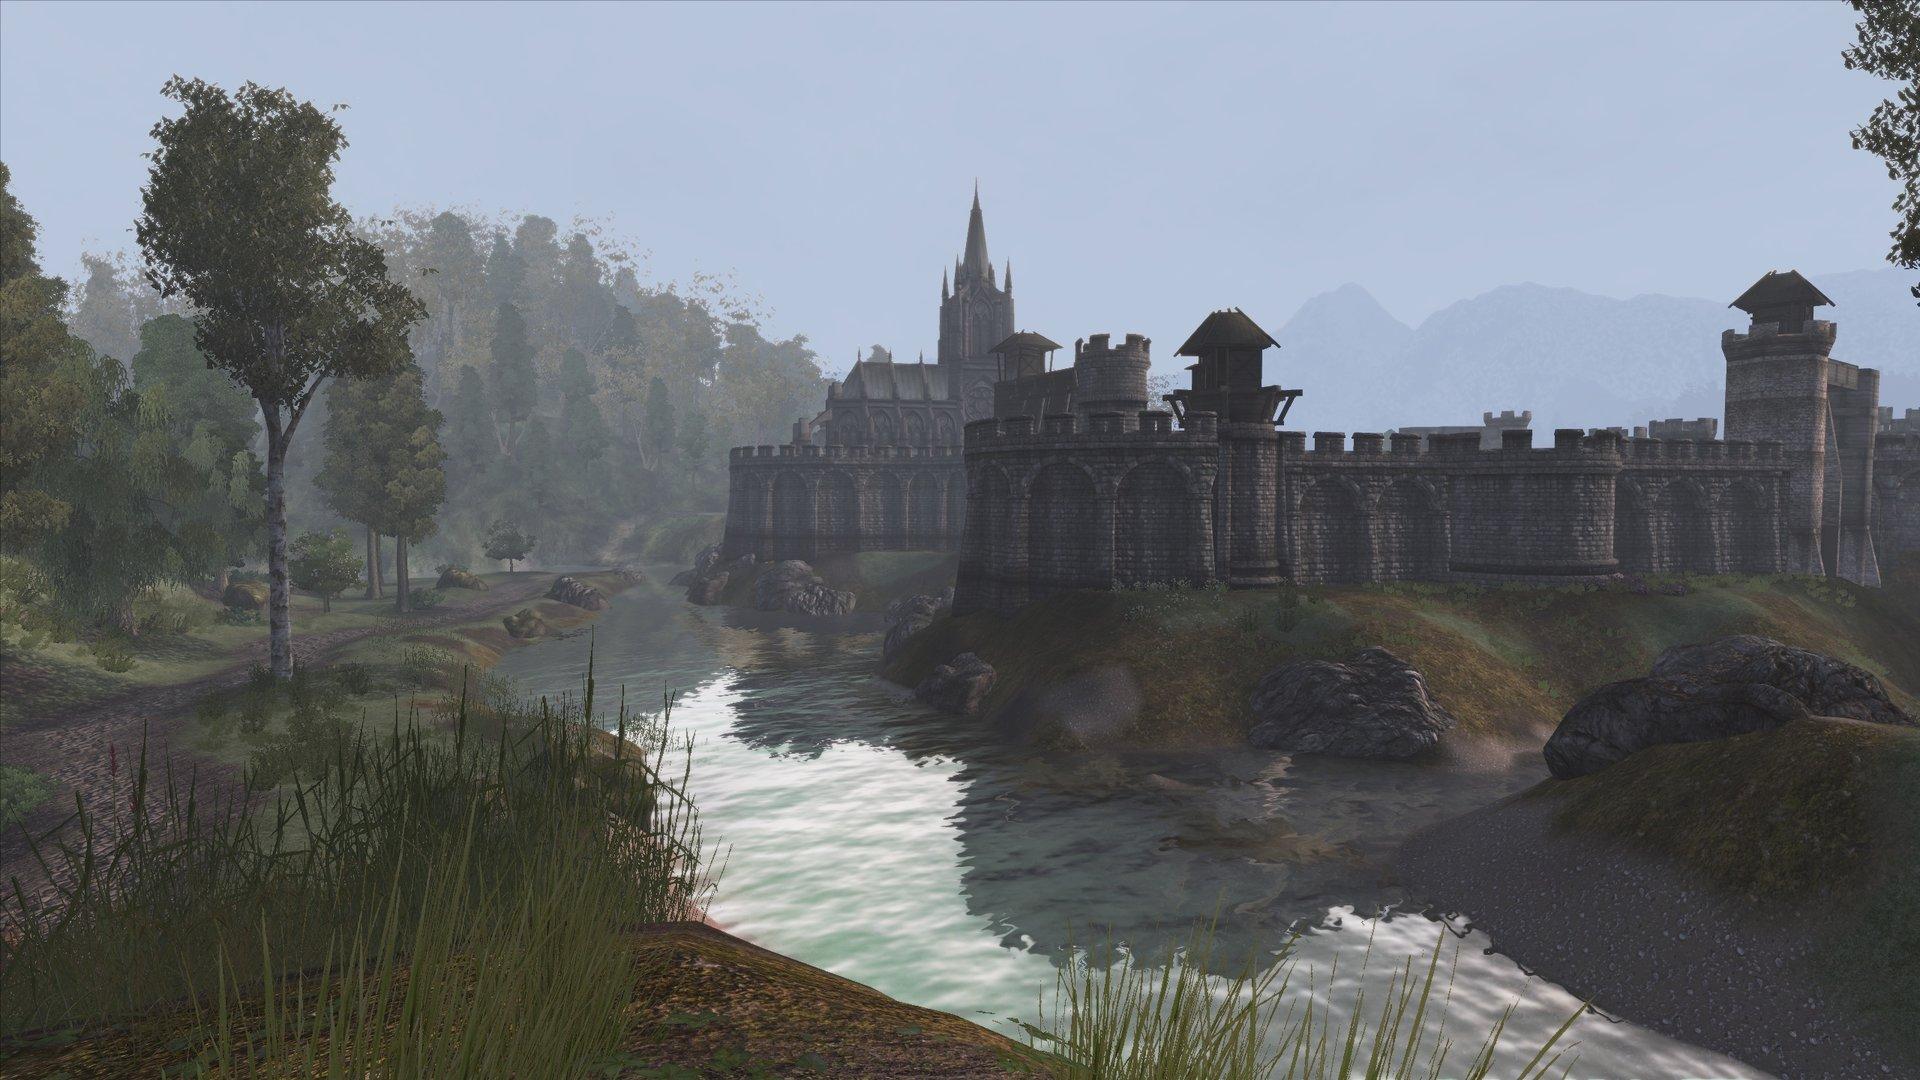 Oblivion20201018 22.07.09.jpg